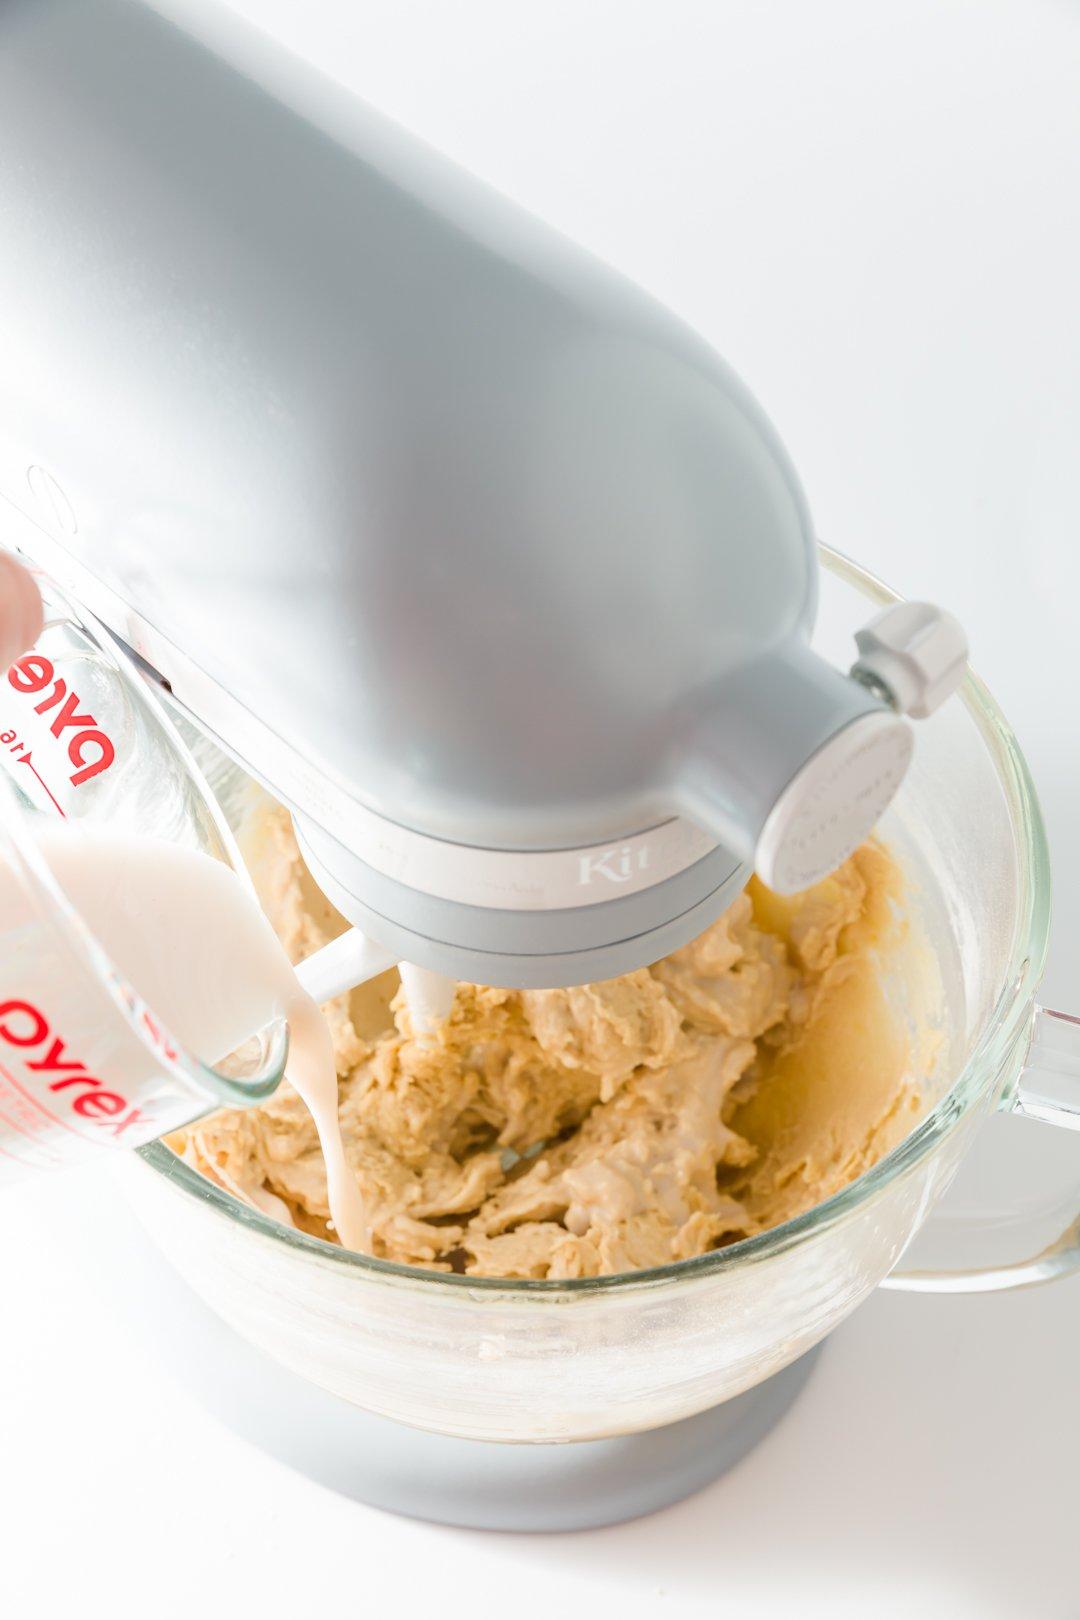 Adding milk to batter